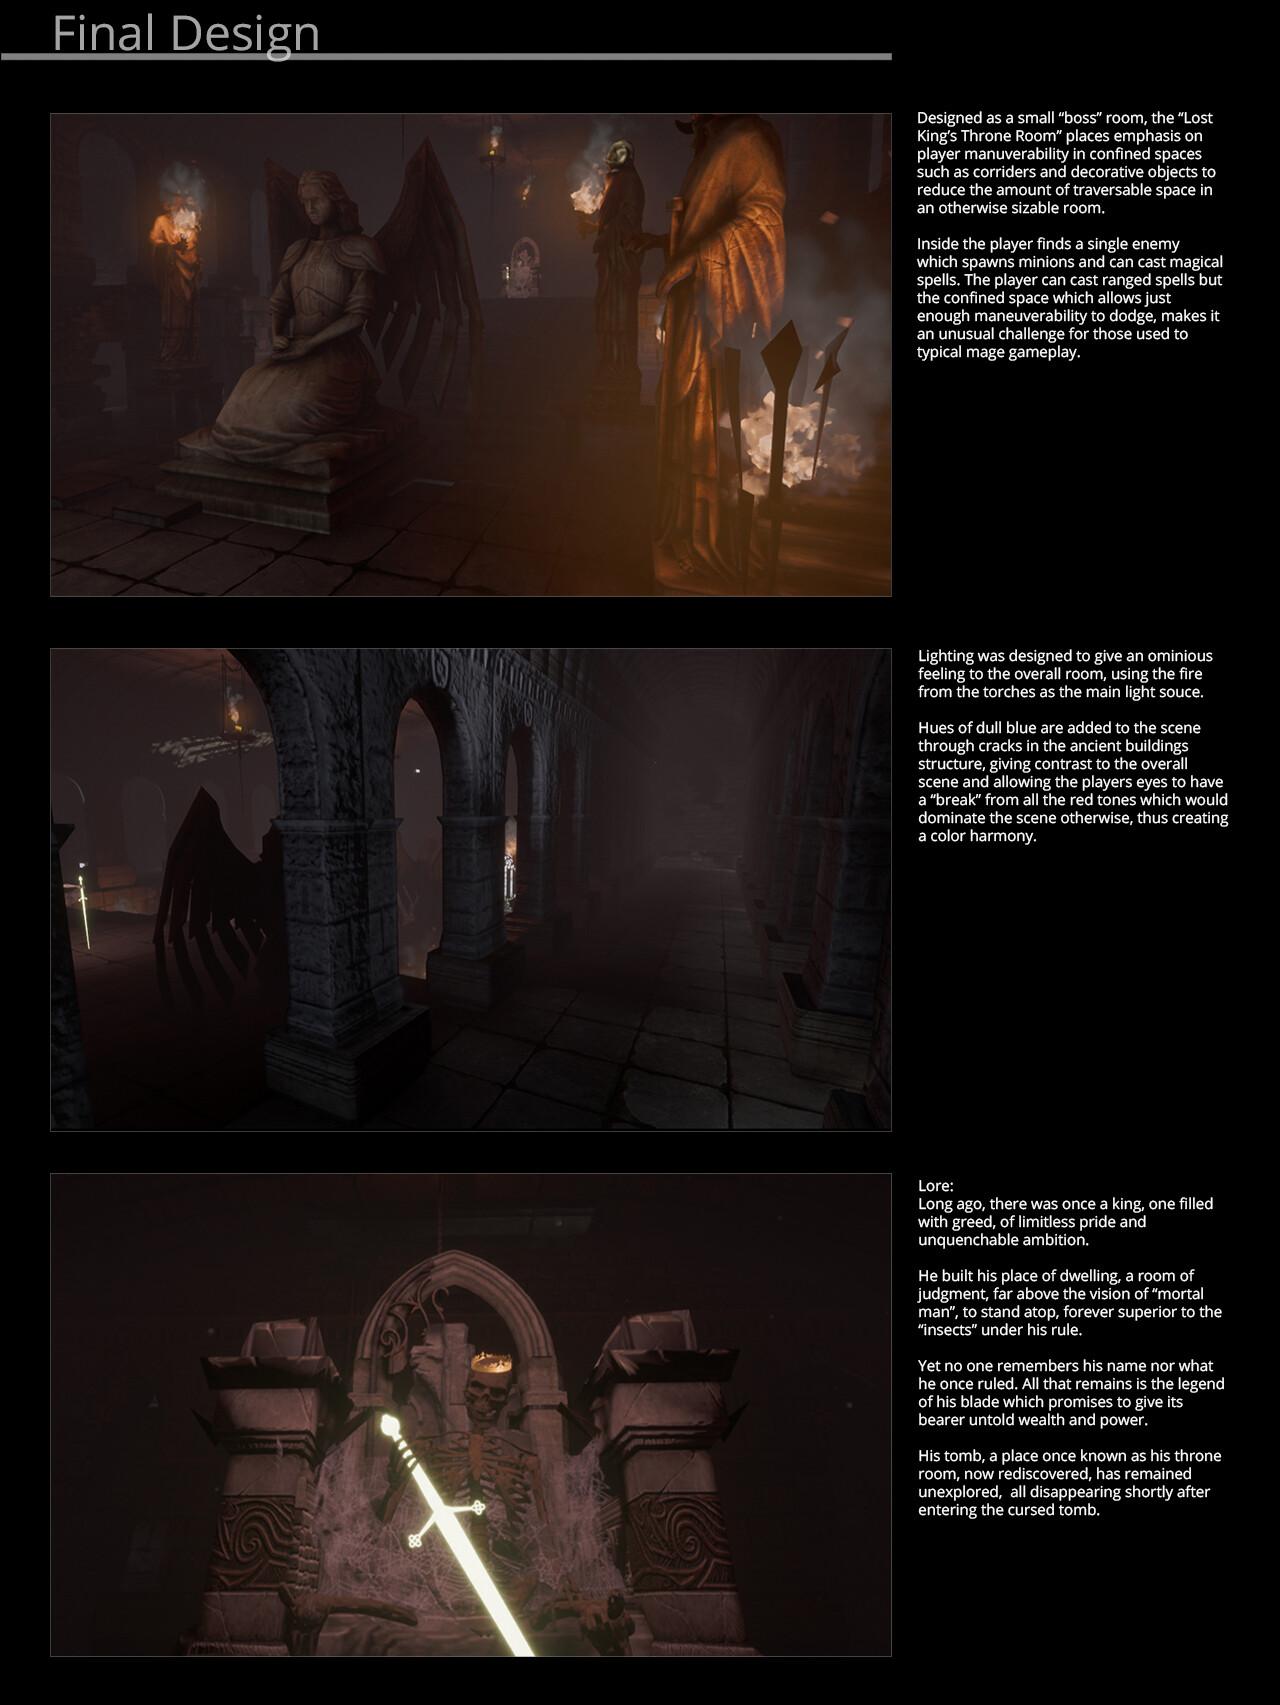 ArtStation - Lost King's Throne Room , Jonathan Solis